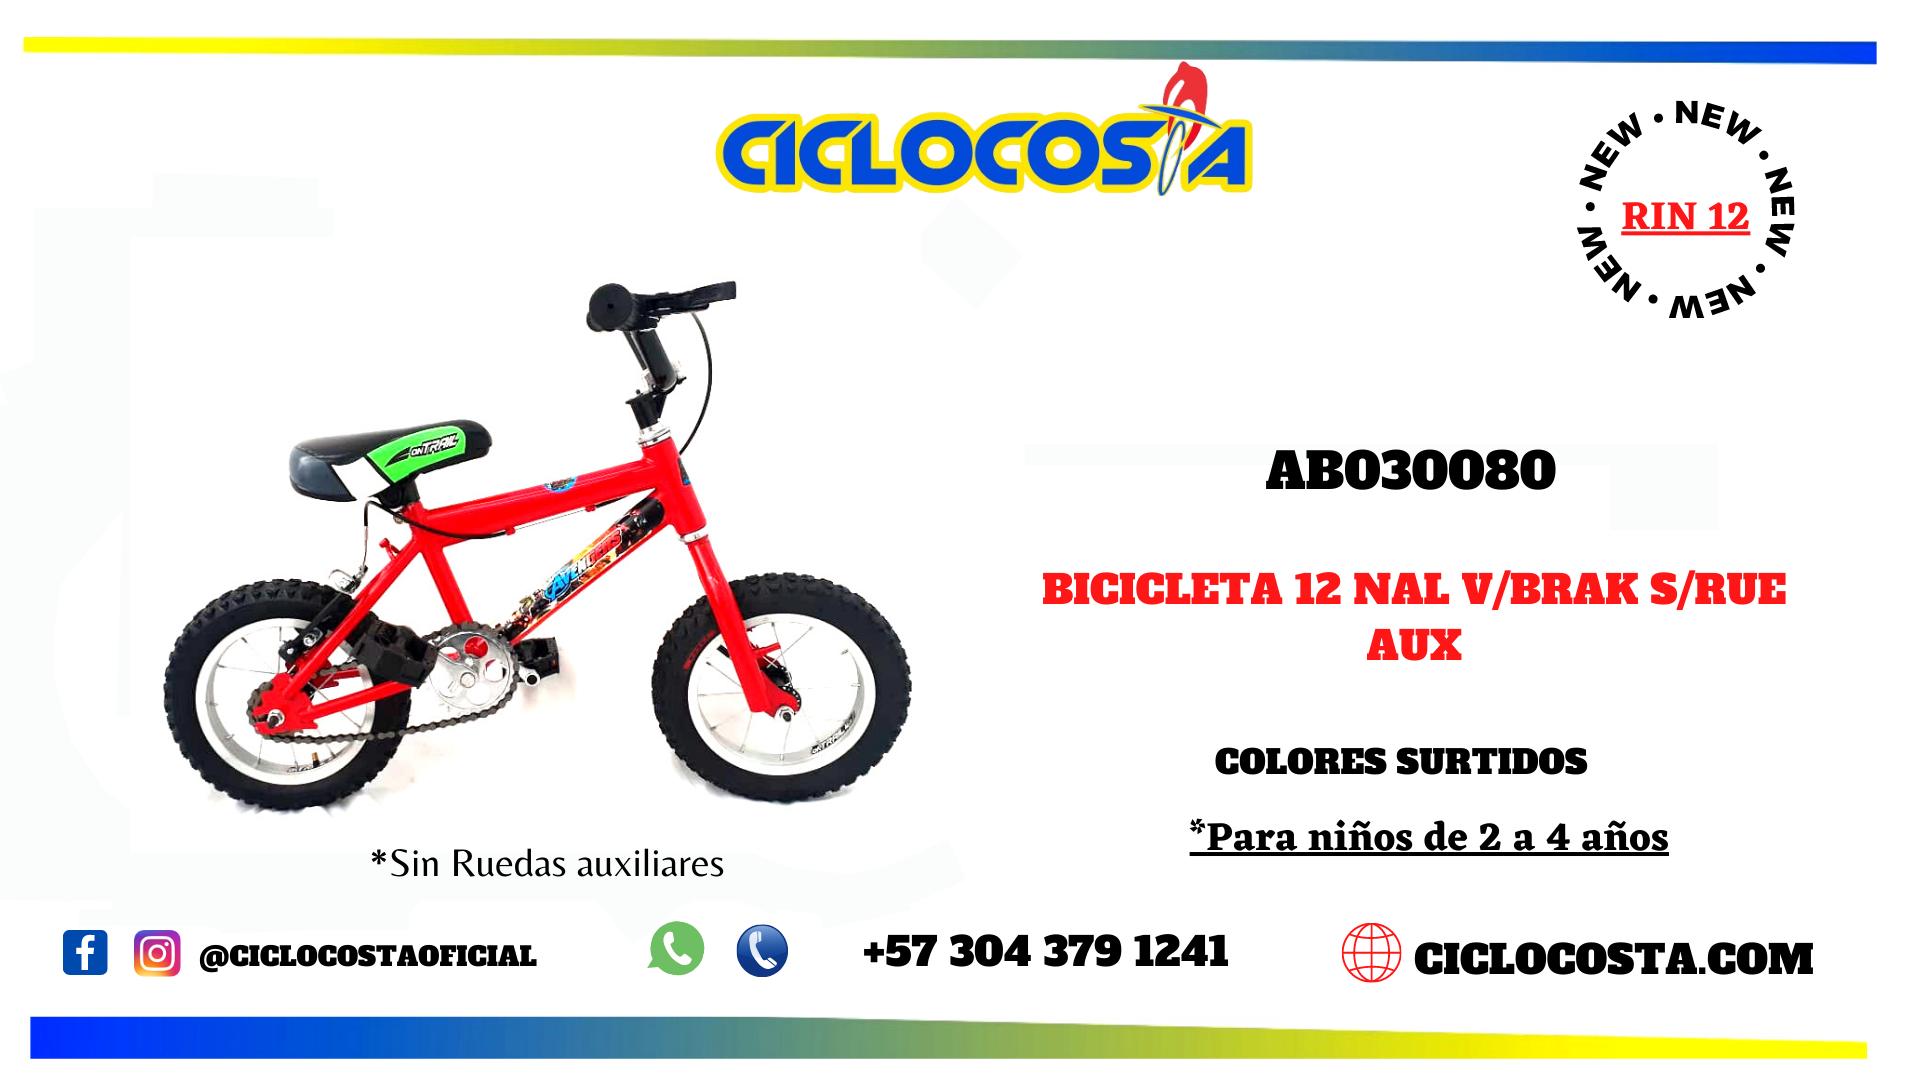 AB030080 RIN 12